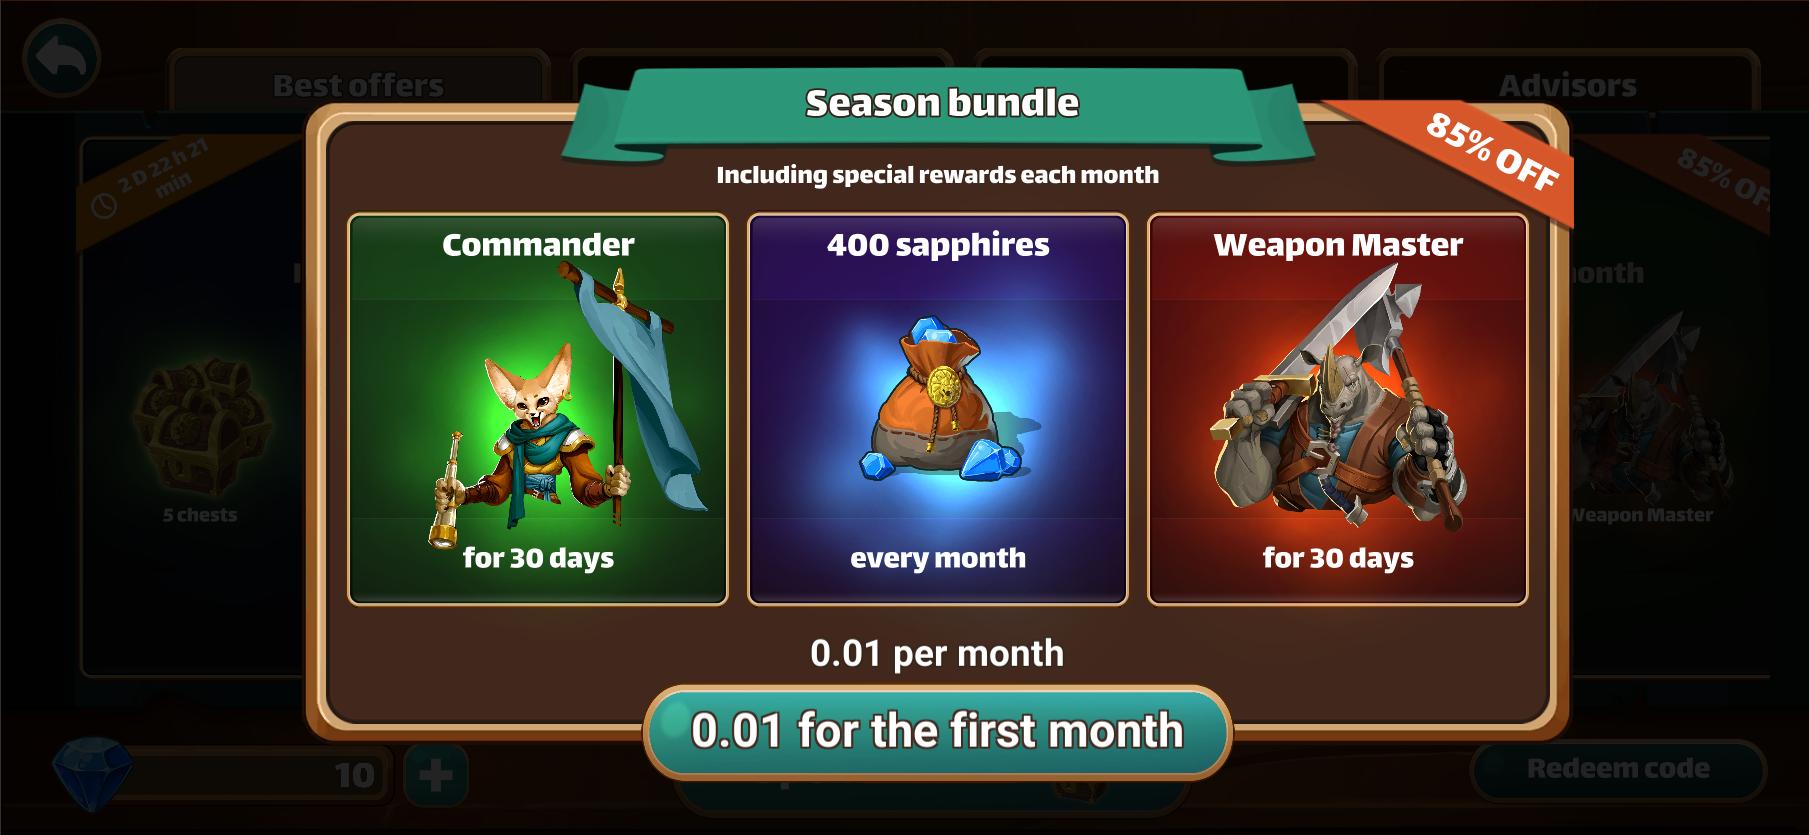 Million Lords - Season bundle offer